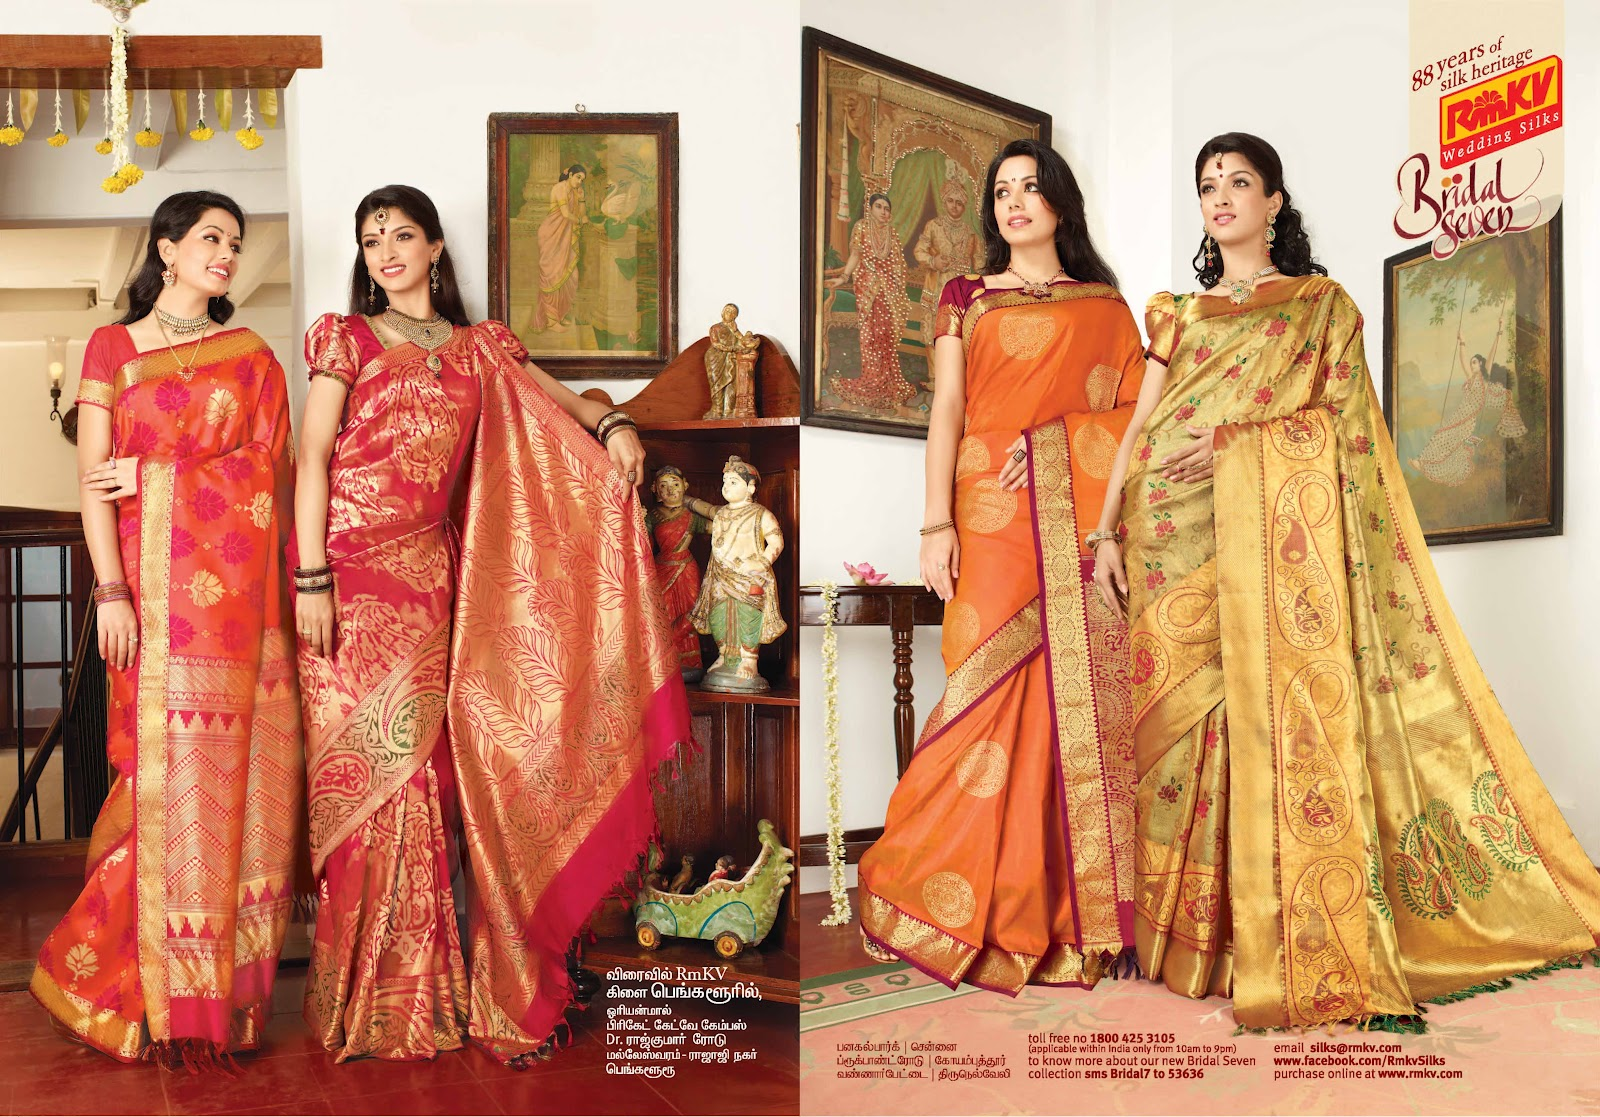 Actinic Light Photography Rmkv Bridal Seven Subrata Bhowmick Design